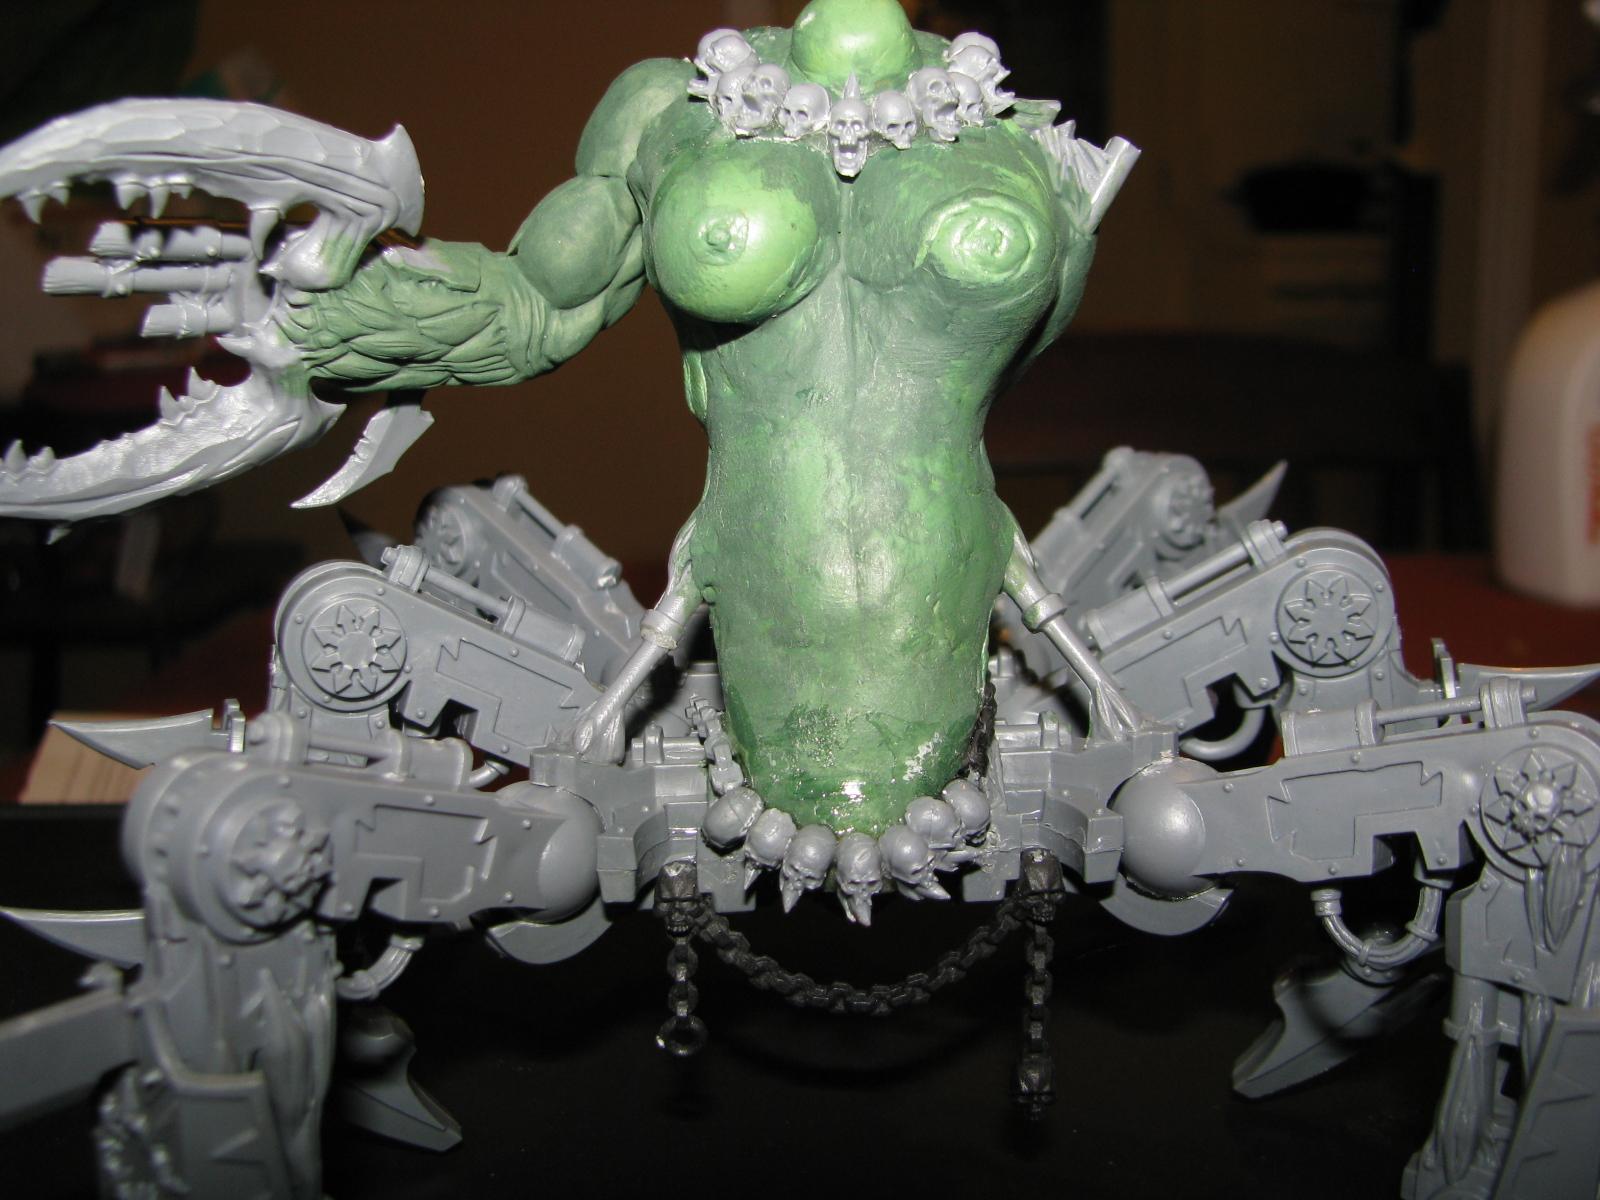 Chaos Space Marines, Daemons, Greenstuff, Scratch Build, Slaanesh, Soal Grinder, Warhammer 40,000